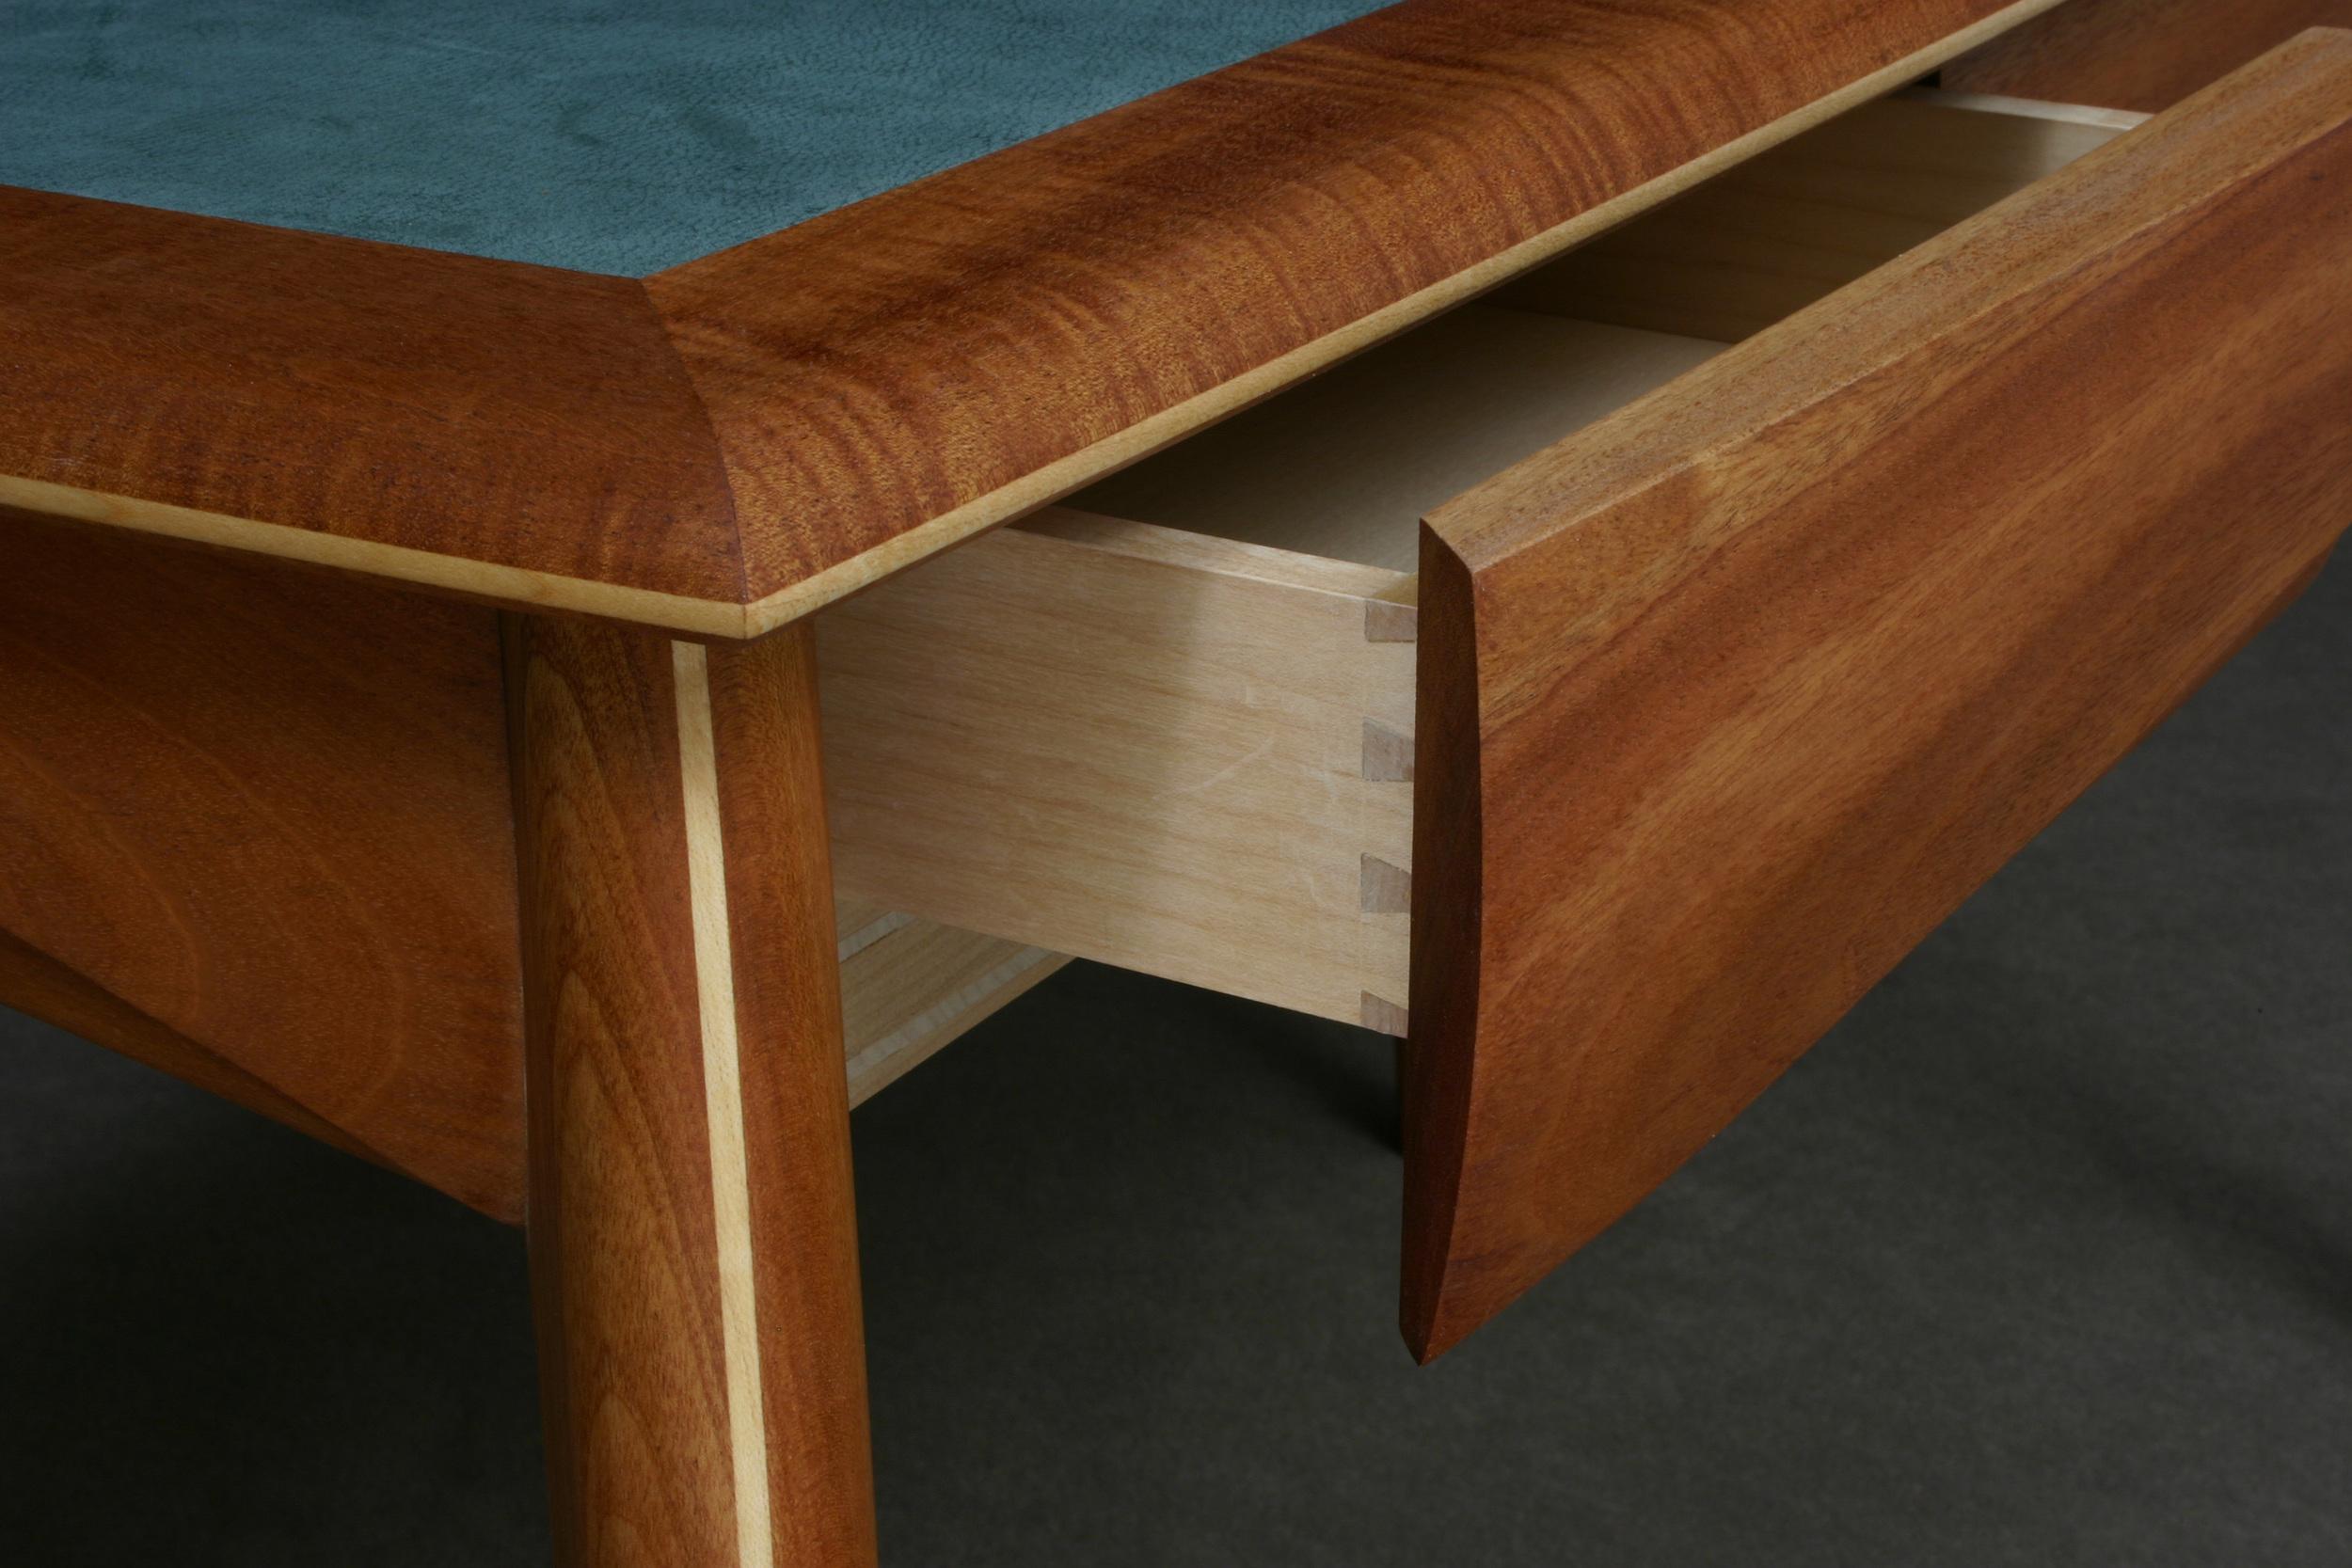 Detail of Kort Desk